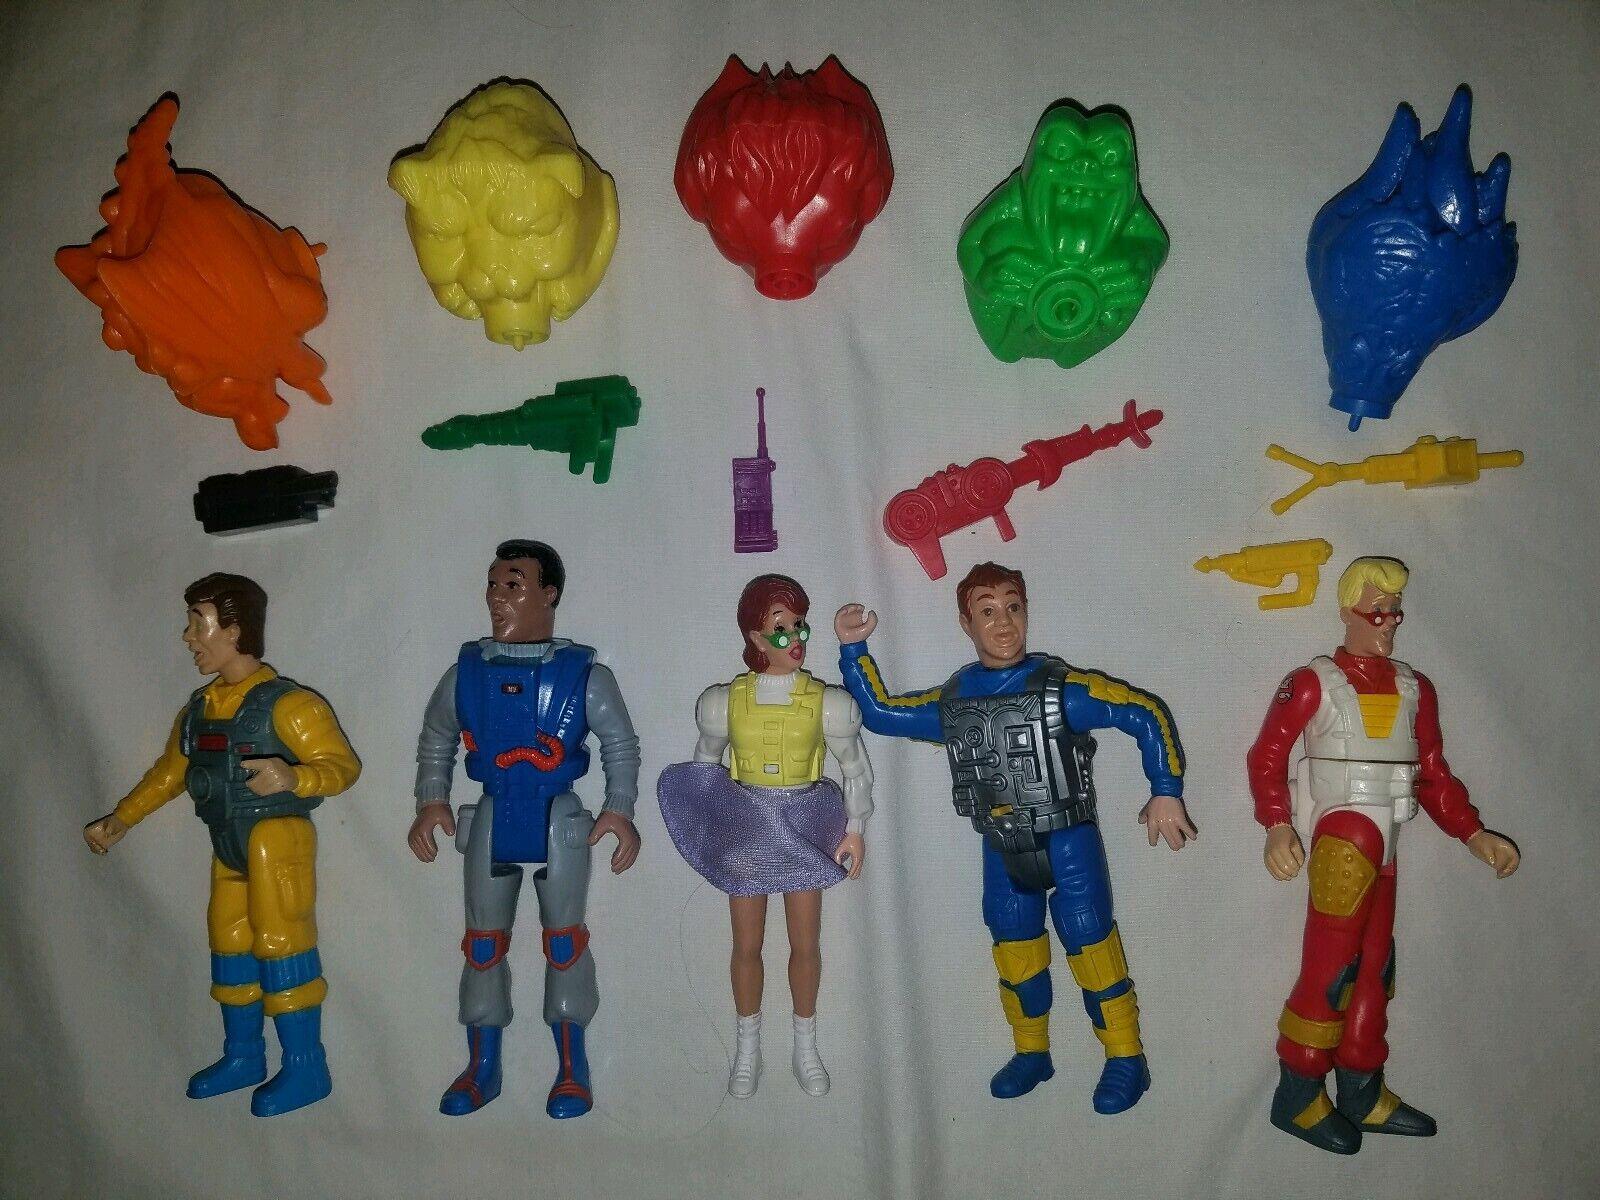 1986 Kenner Real Ghostbusters SCREAMING HEROES Set of 5 MINT Complete ghosts